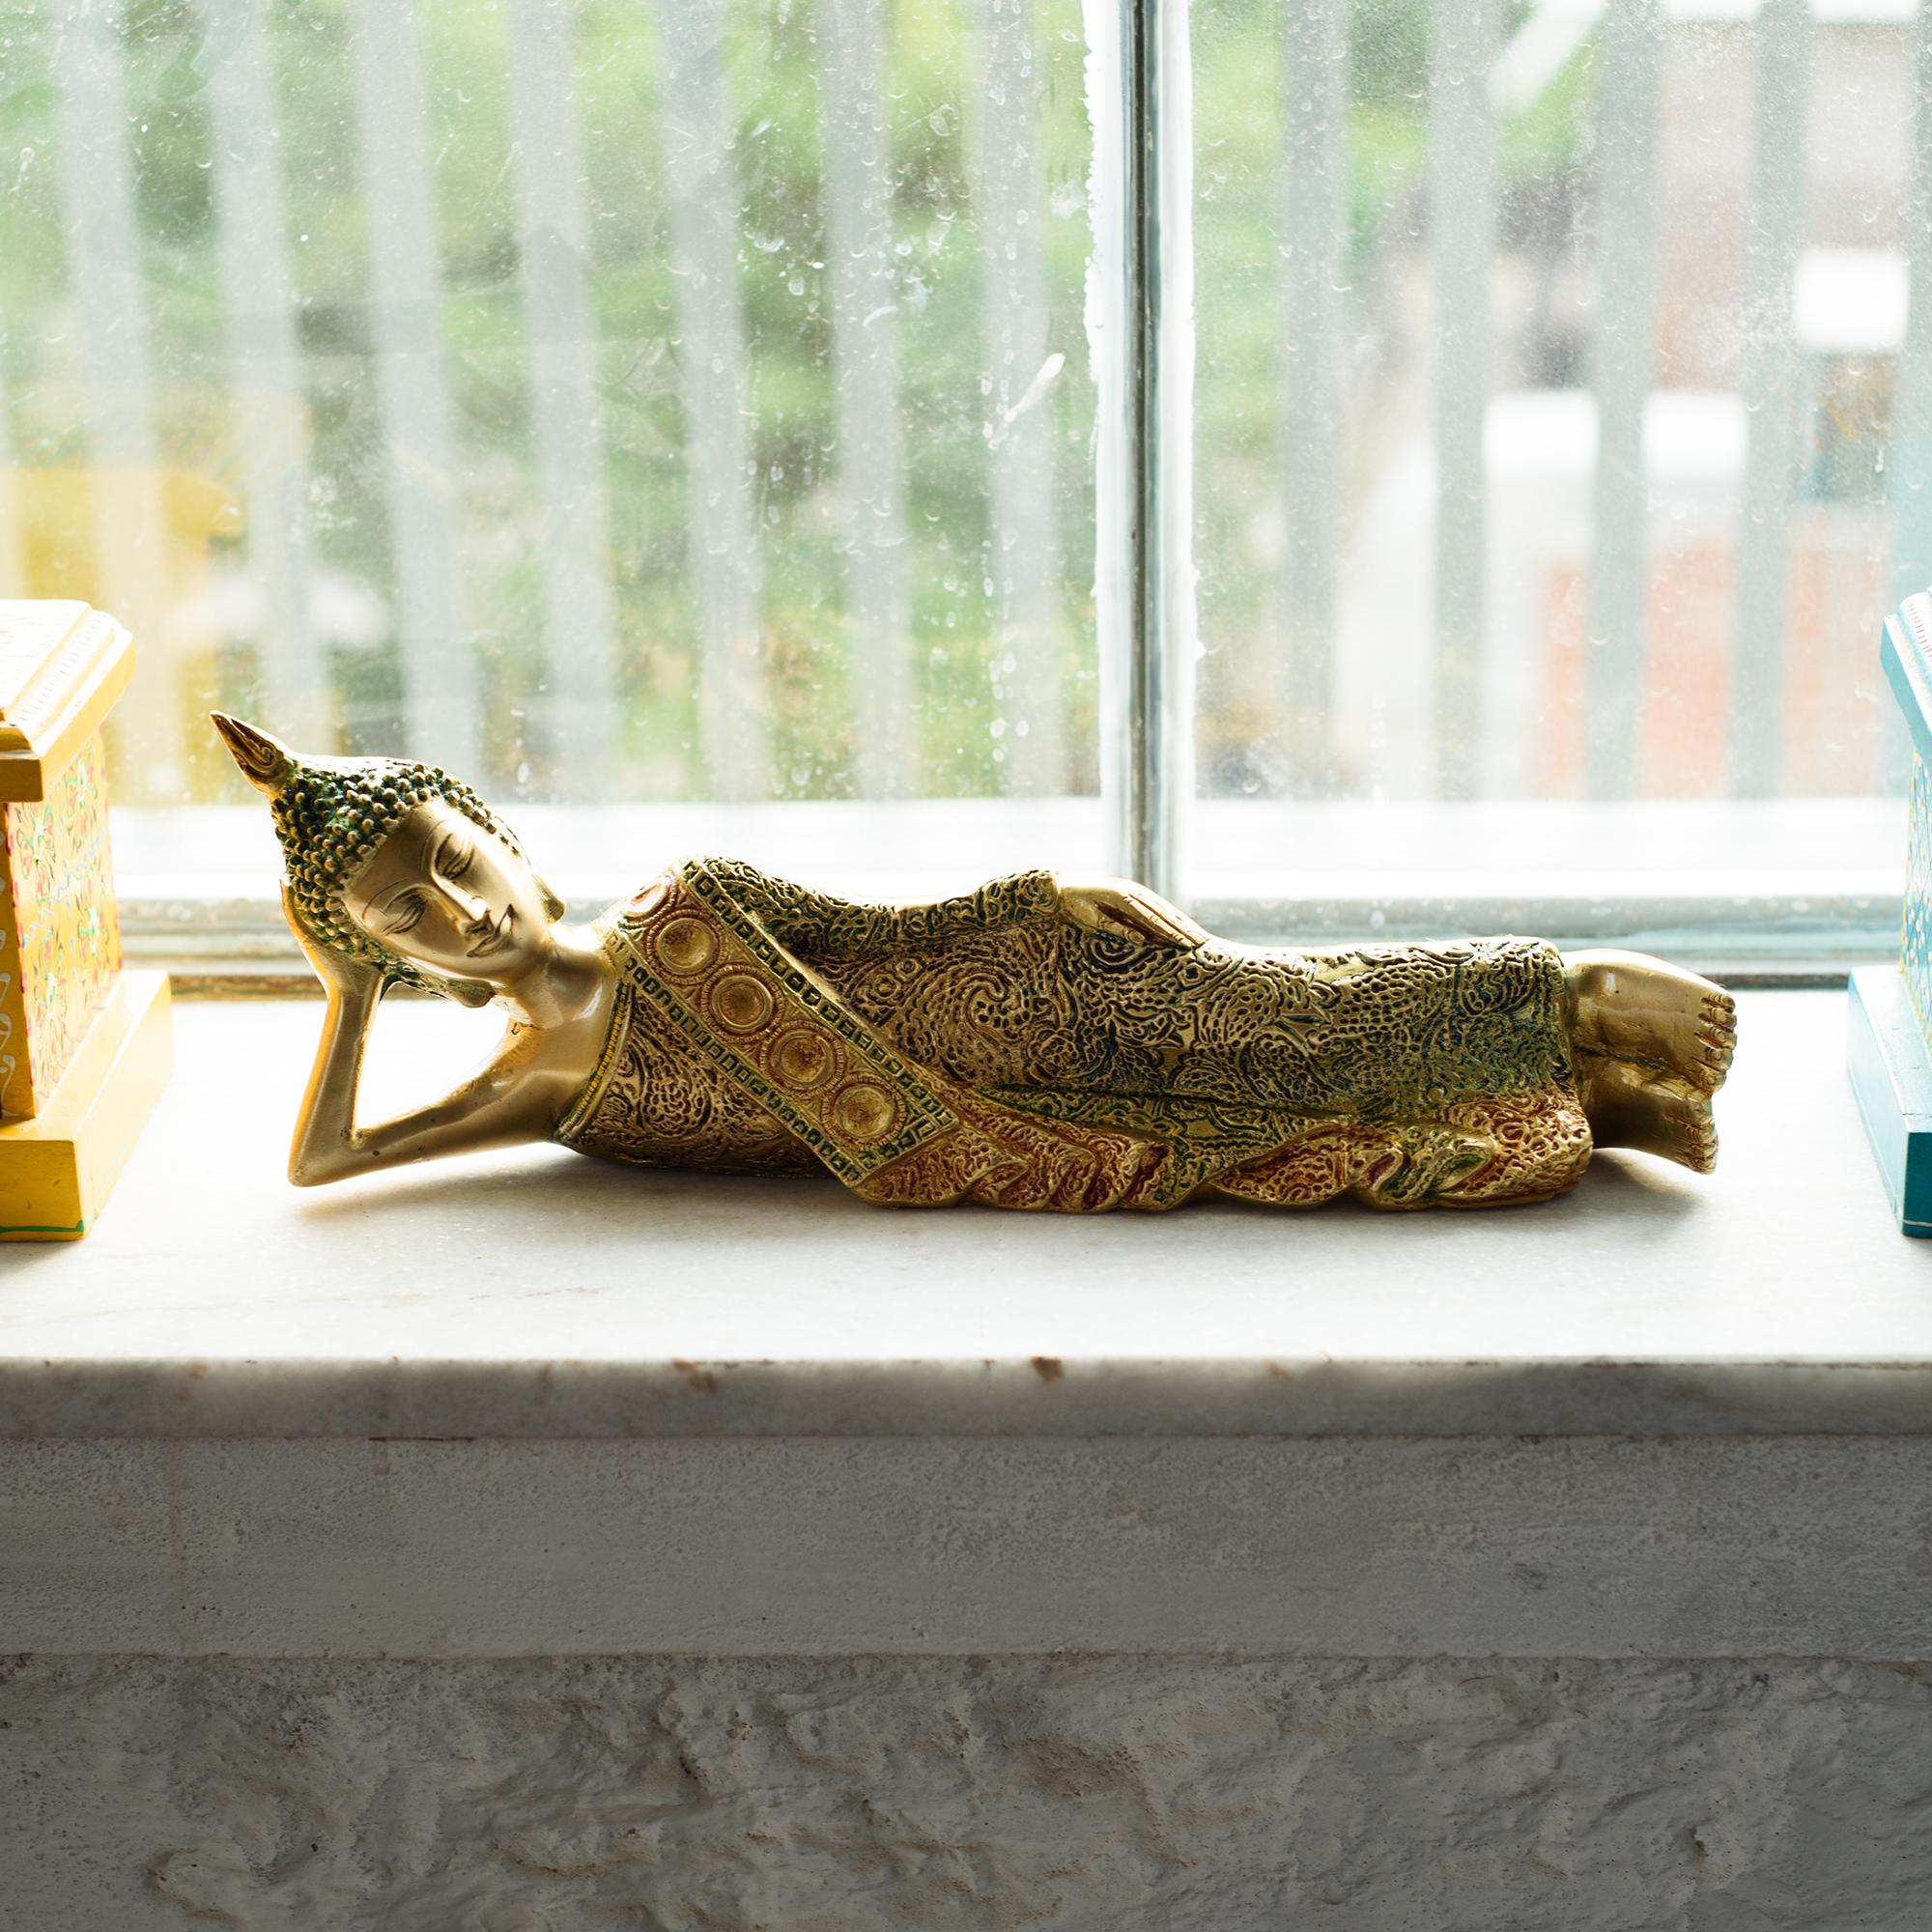 Brass Decorative Thai Reclining Buddha Antique Showpiece Indian Home Decor